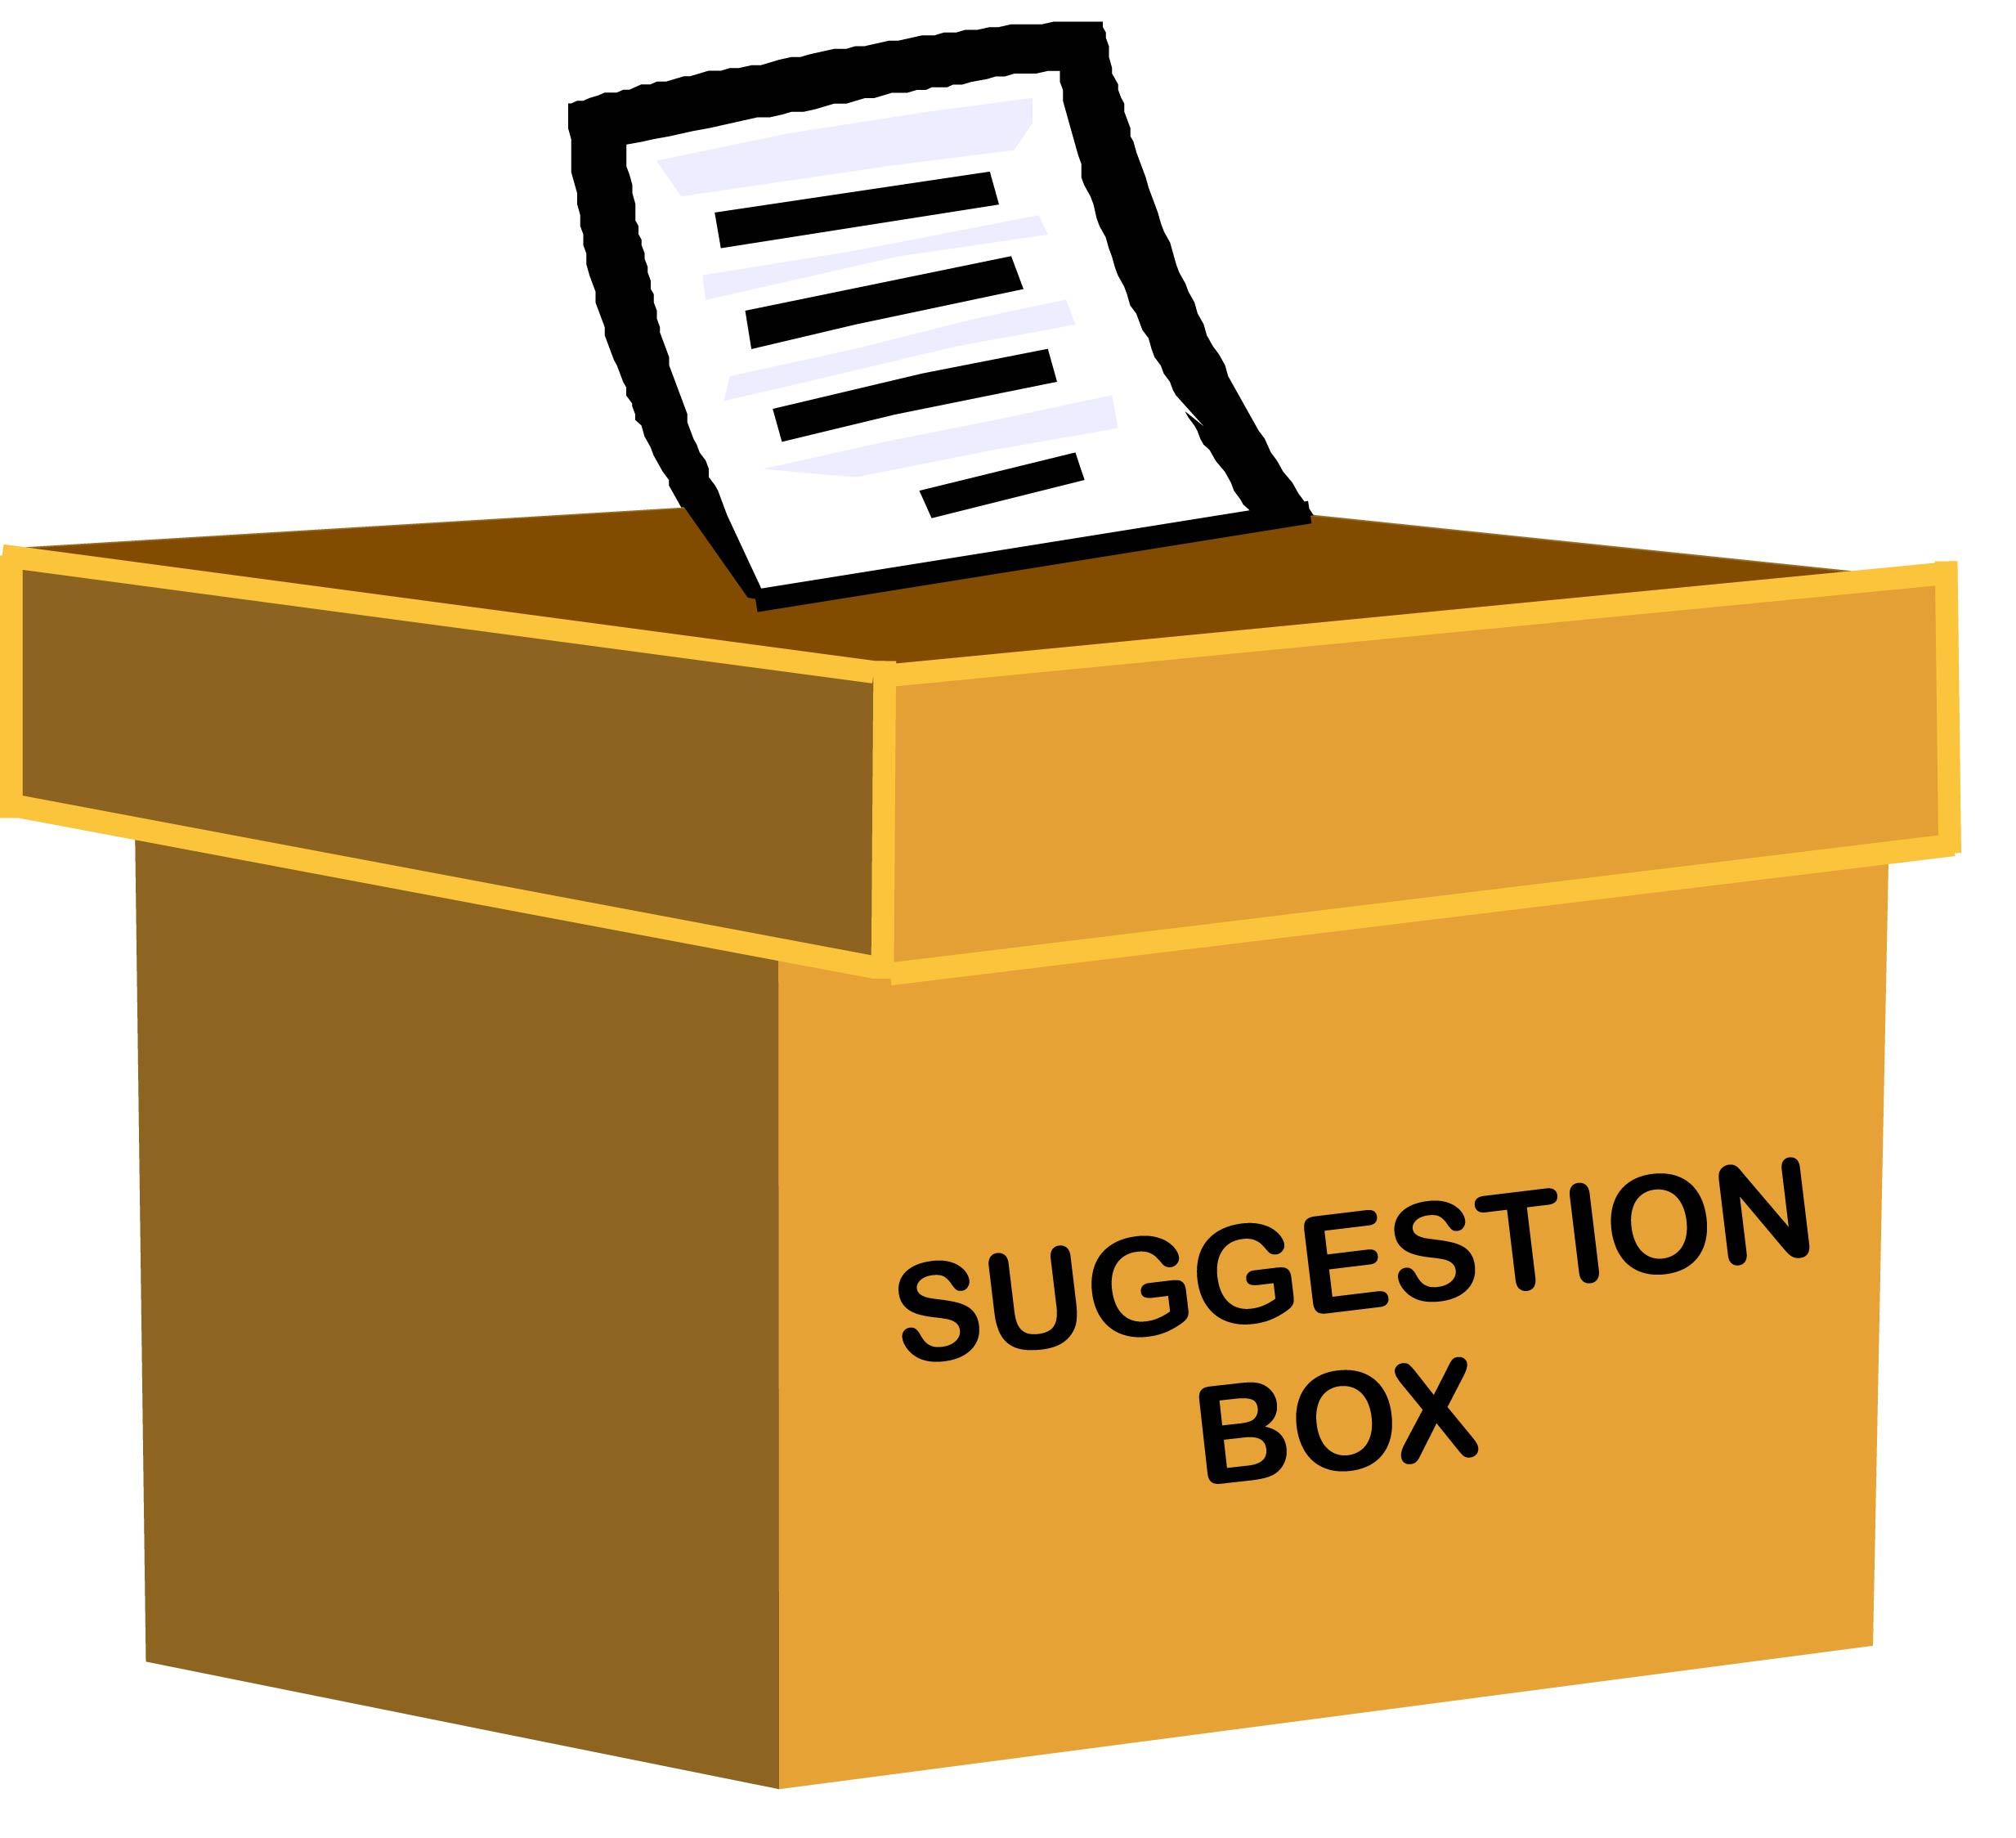 Suggestion box drawing